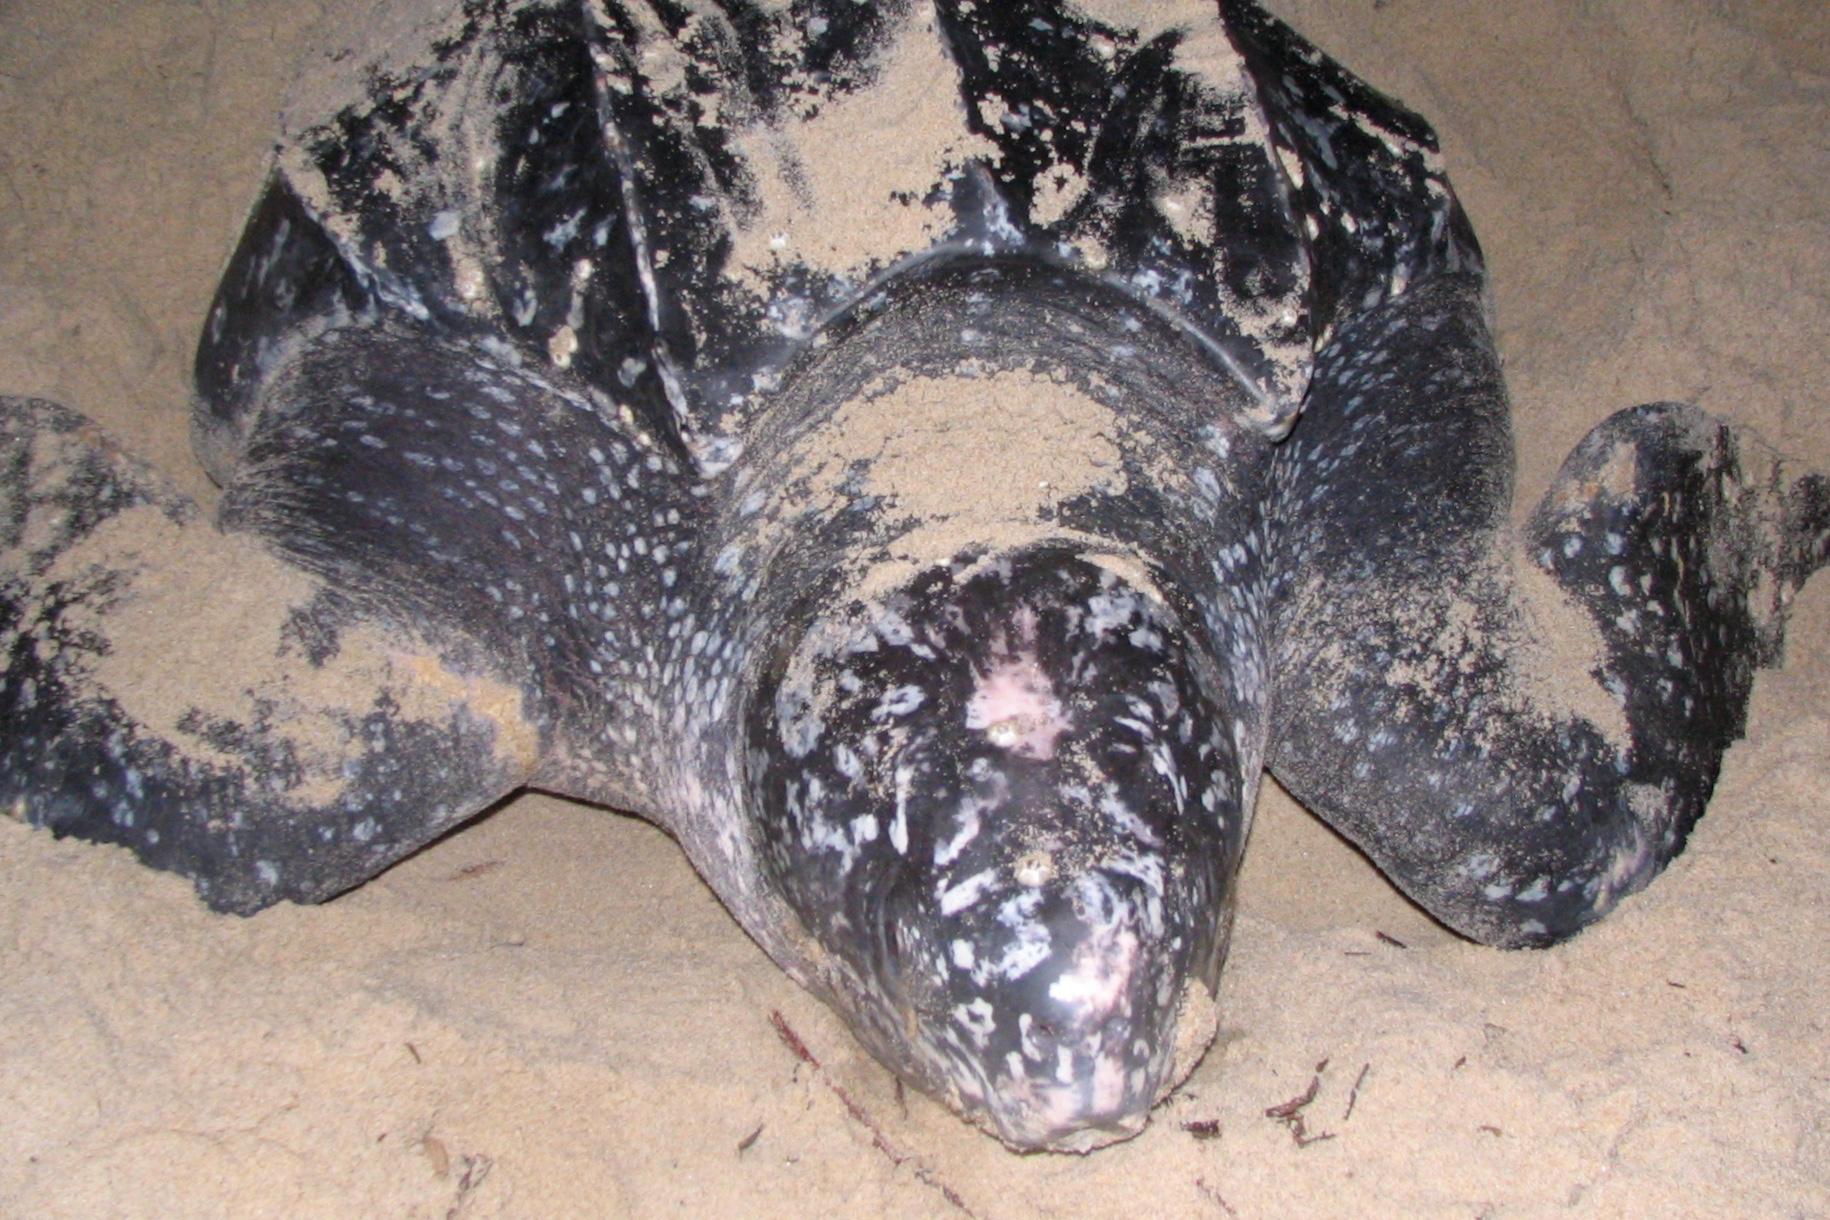 Matura Beach: Leatherback sea turtle.